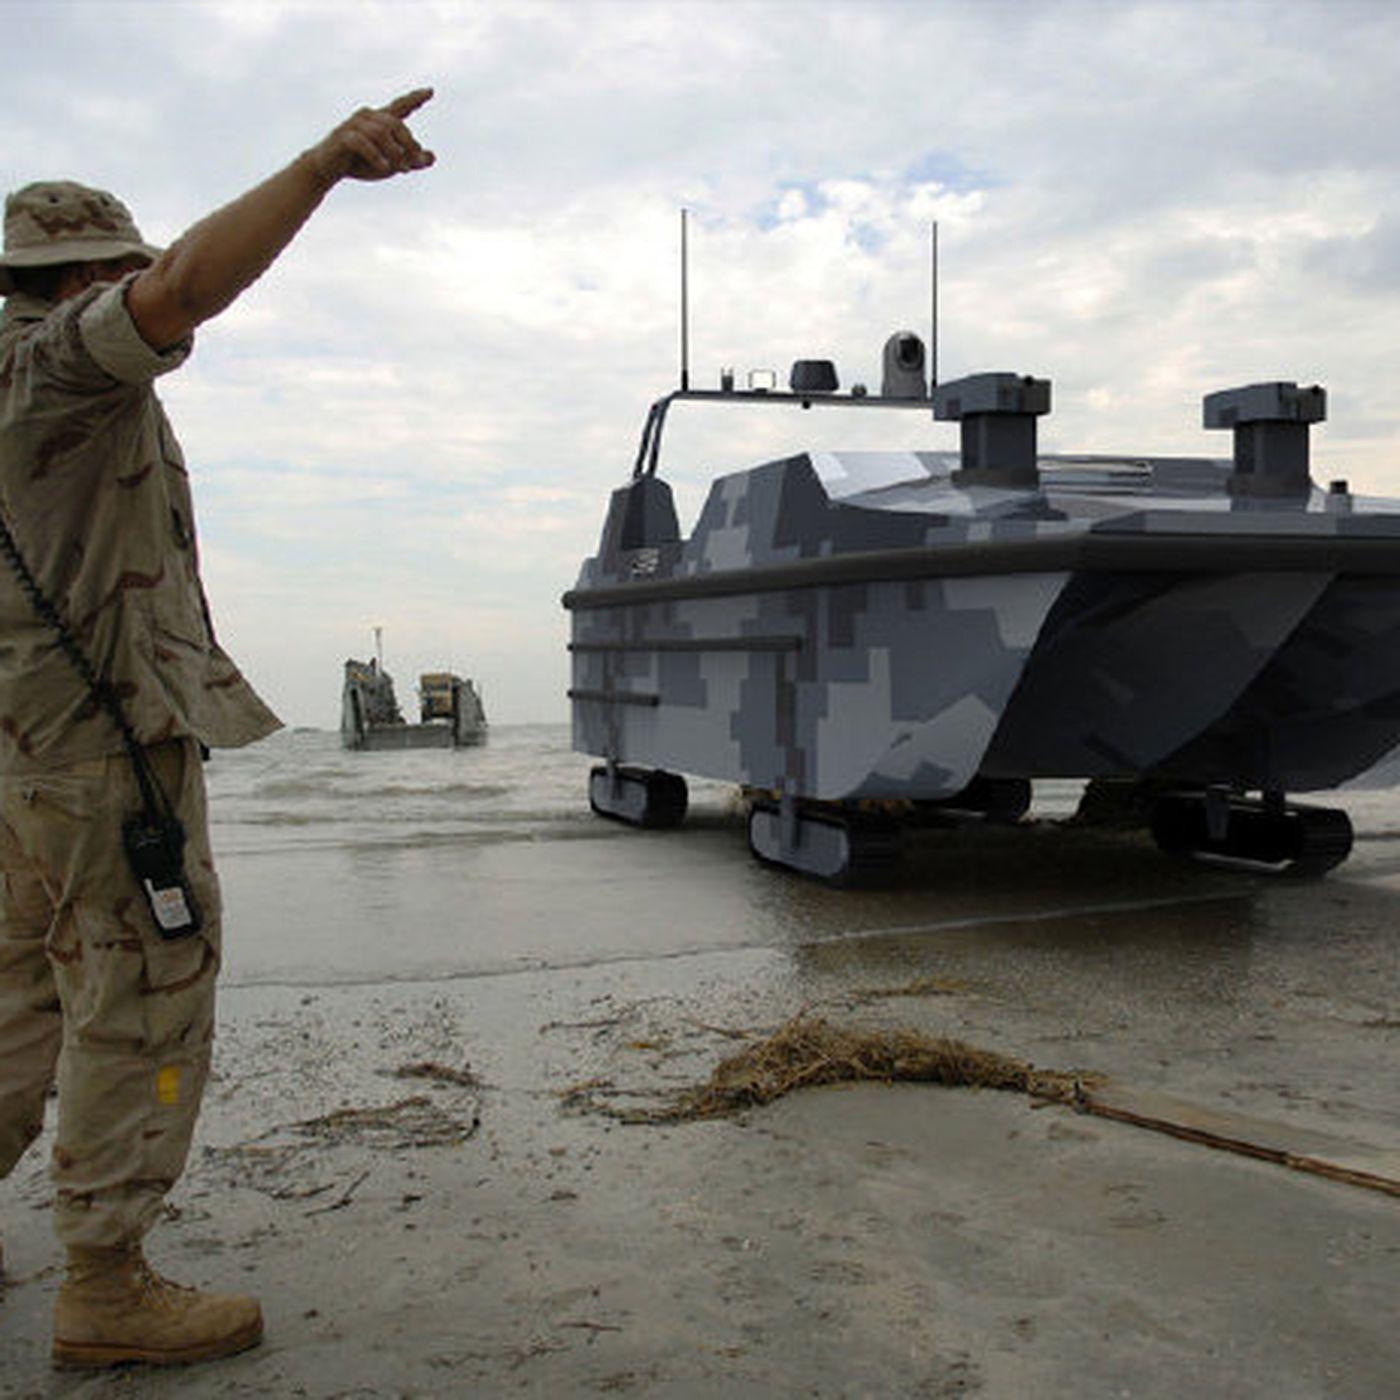 theverge.com - Andrew Liptak - China unveils the first autonomous amphibious military landing vehicle